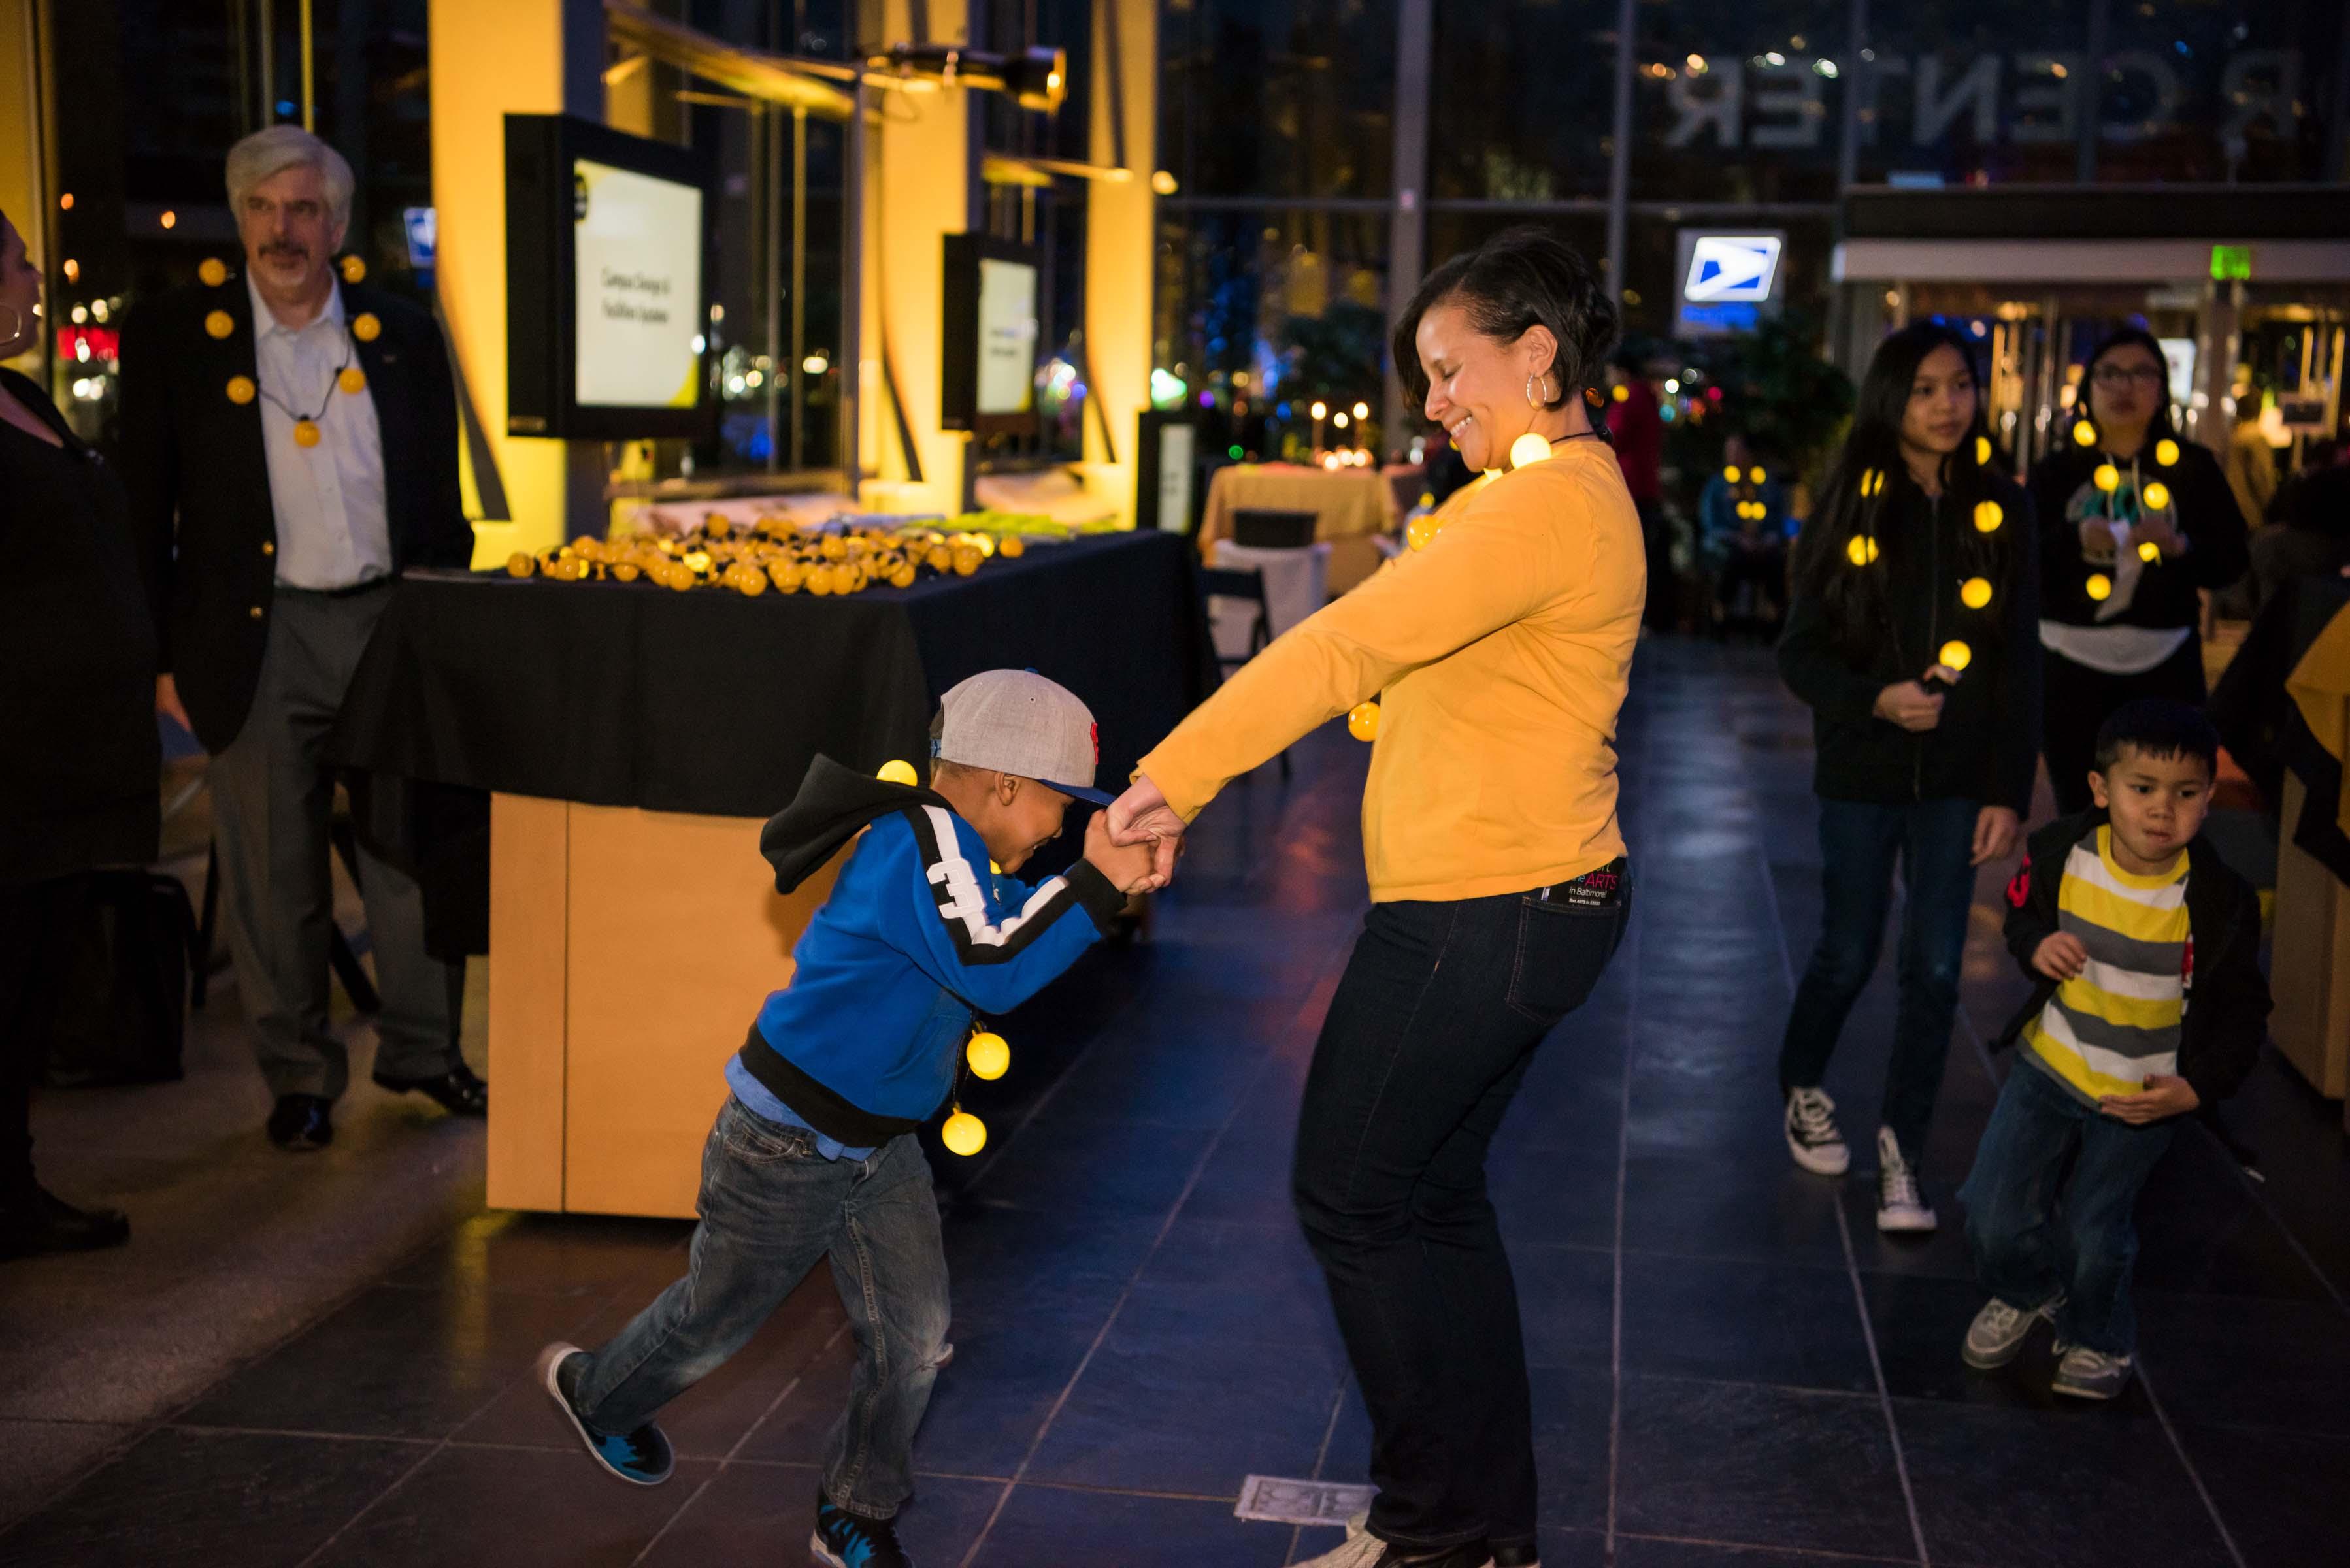 Women dances with little boy at alumni reception